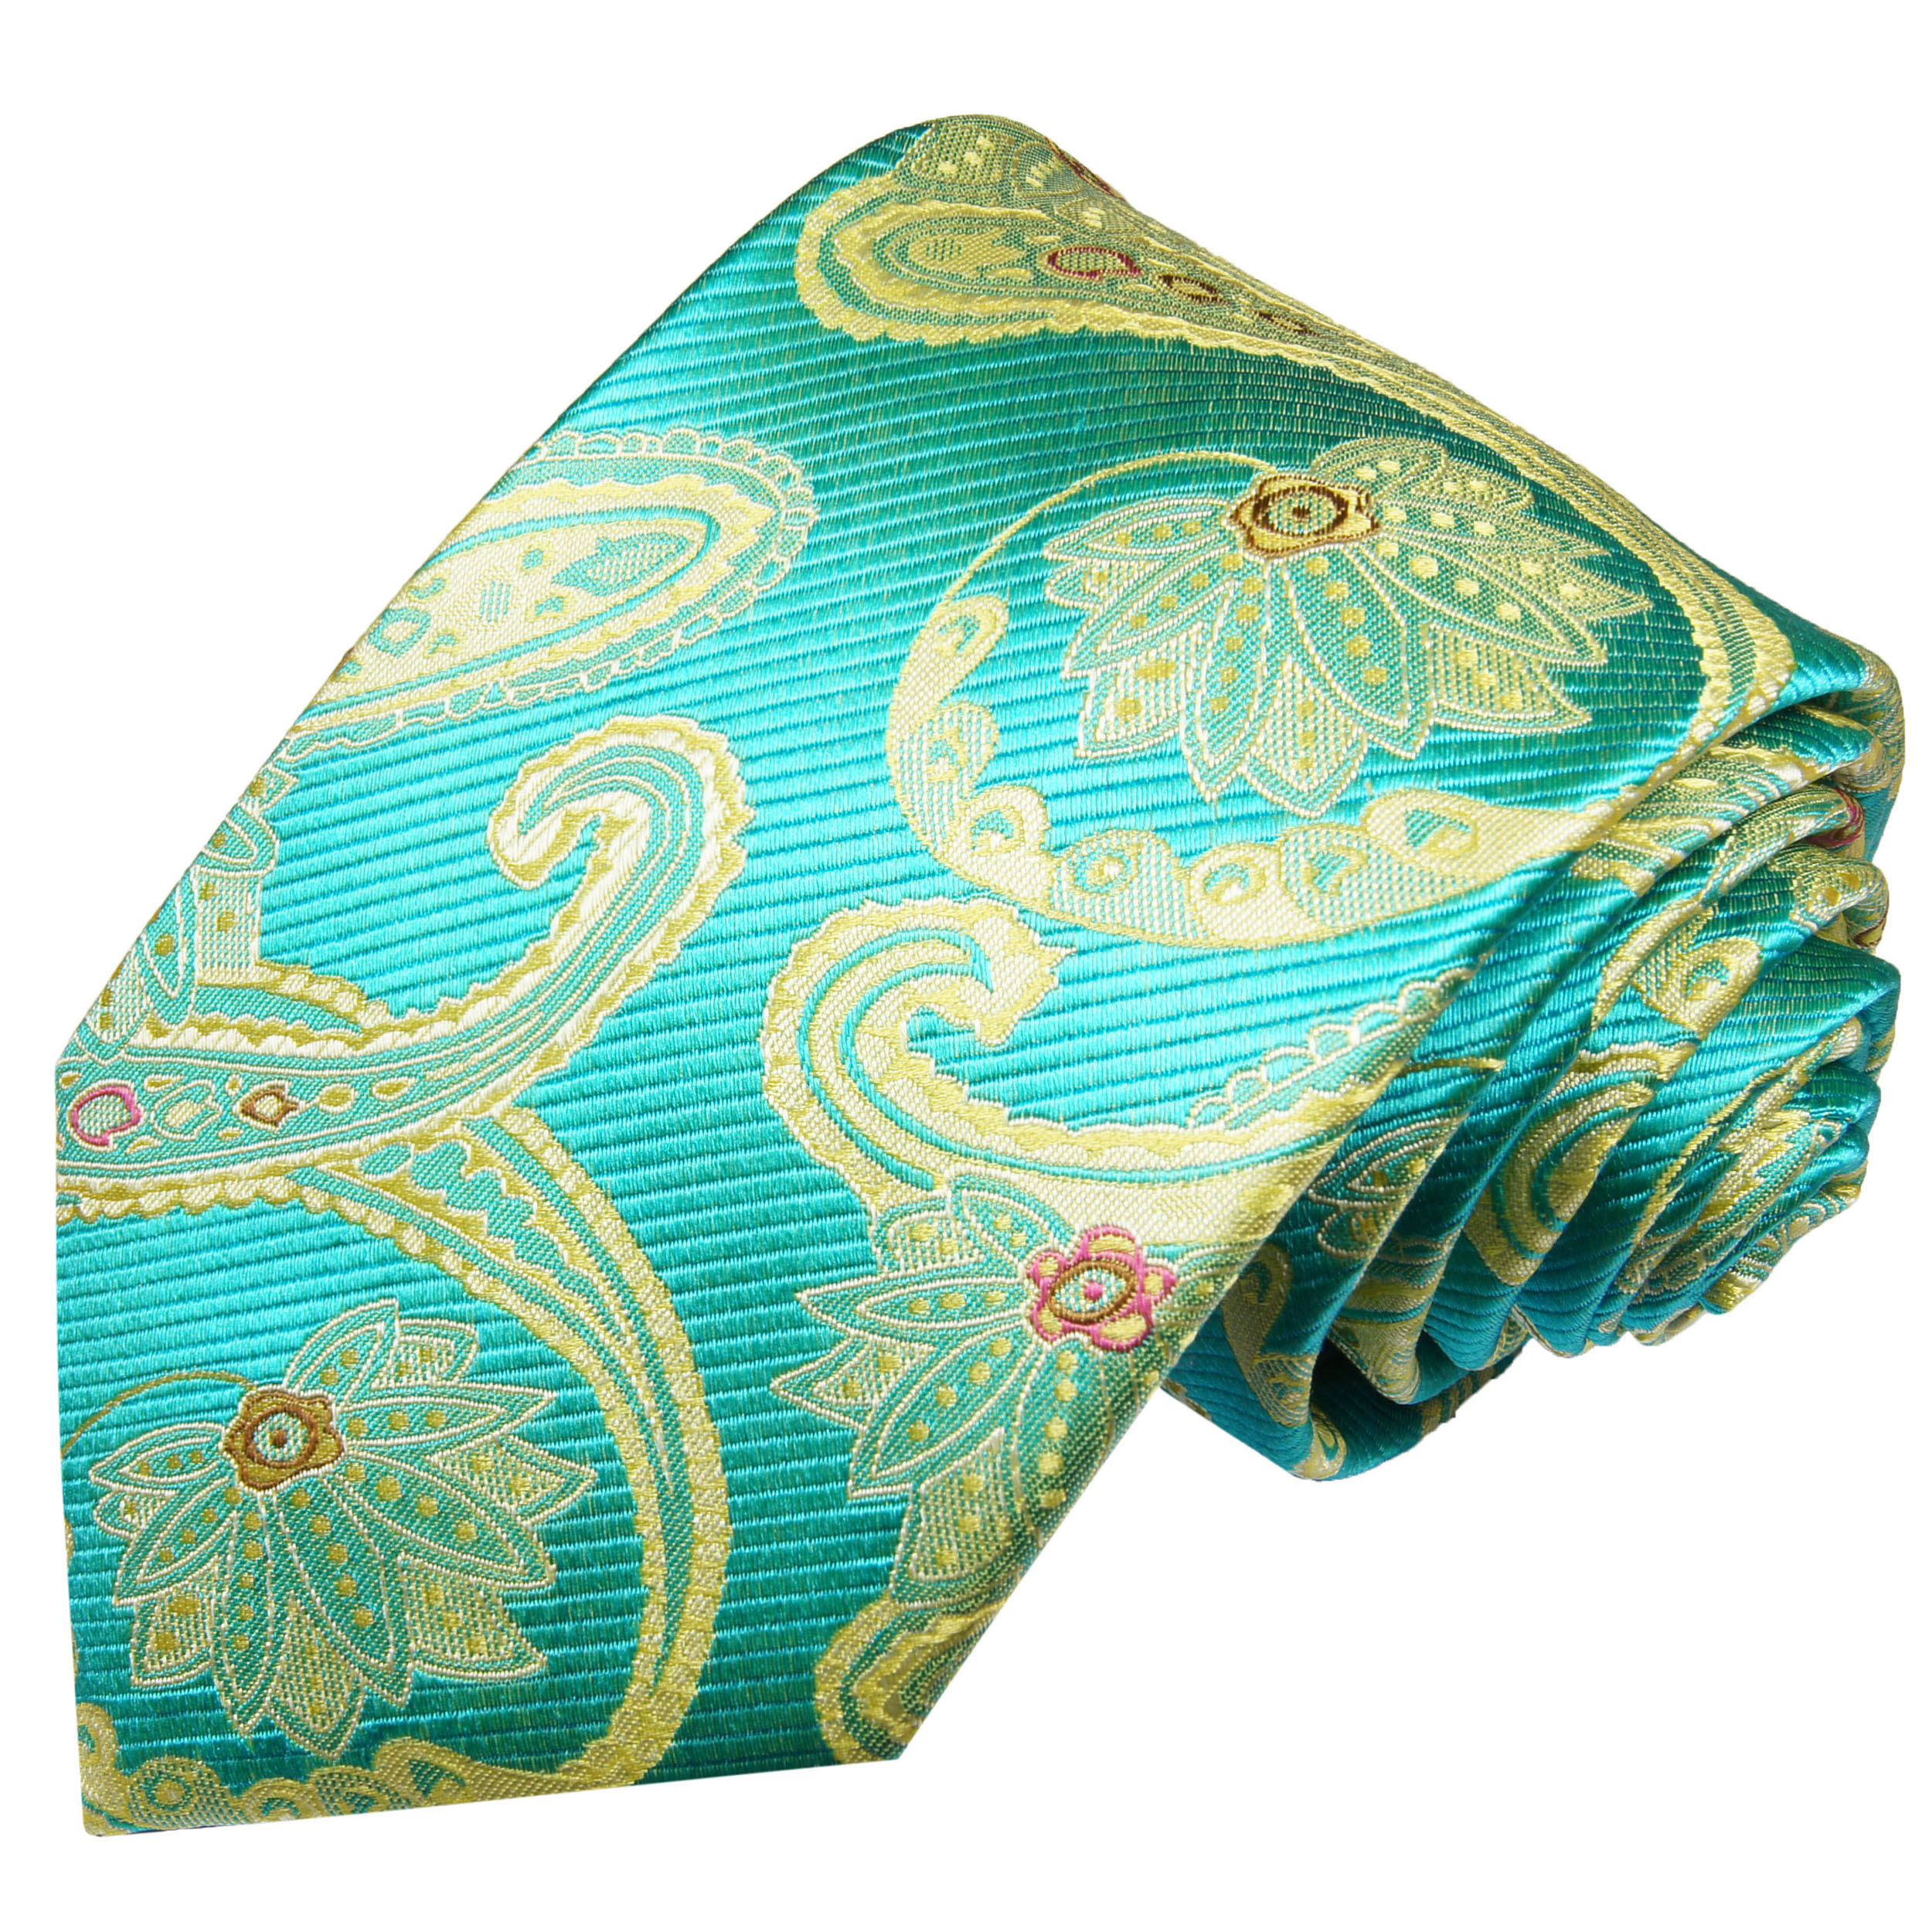 1b1b4fcdb2e Turquoise mens tie paisley   silk necktie 2024 - Paul Malone Shop